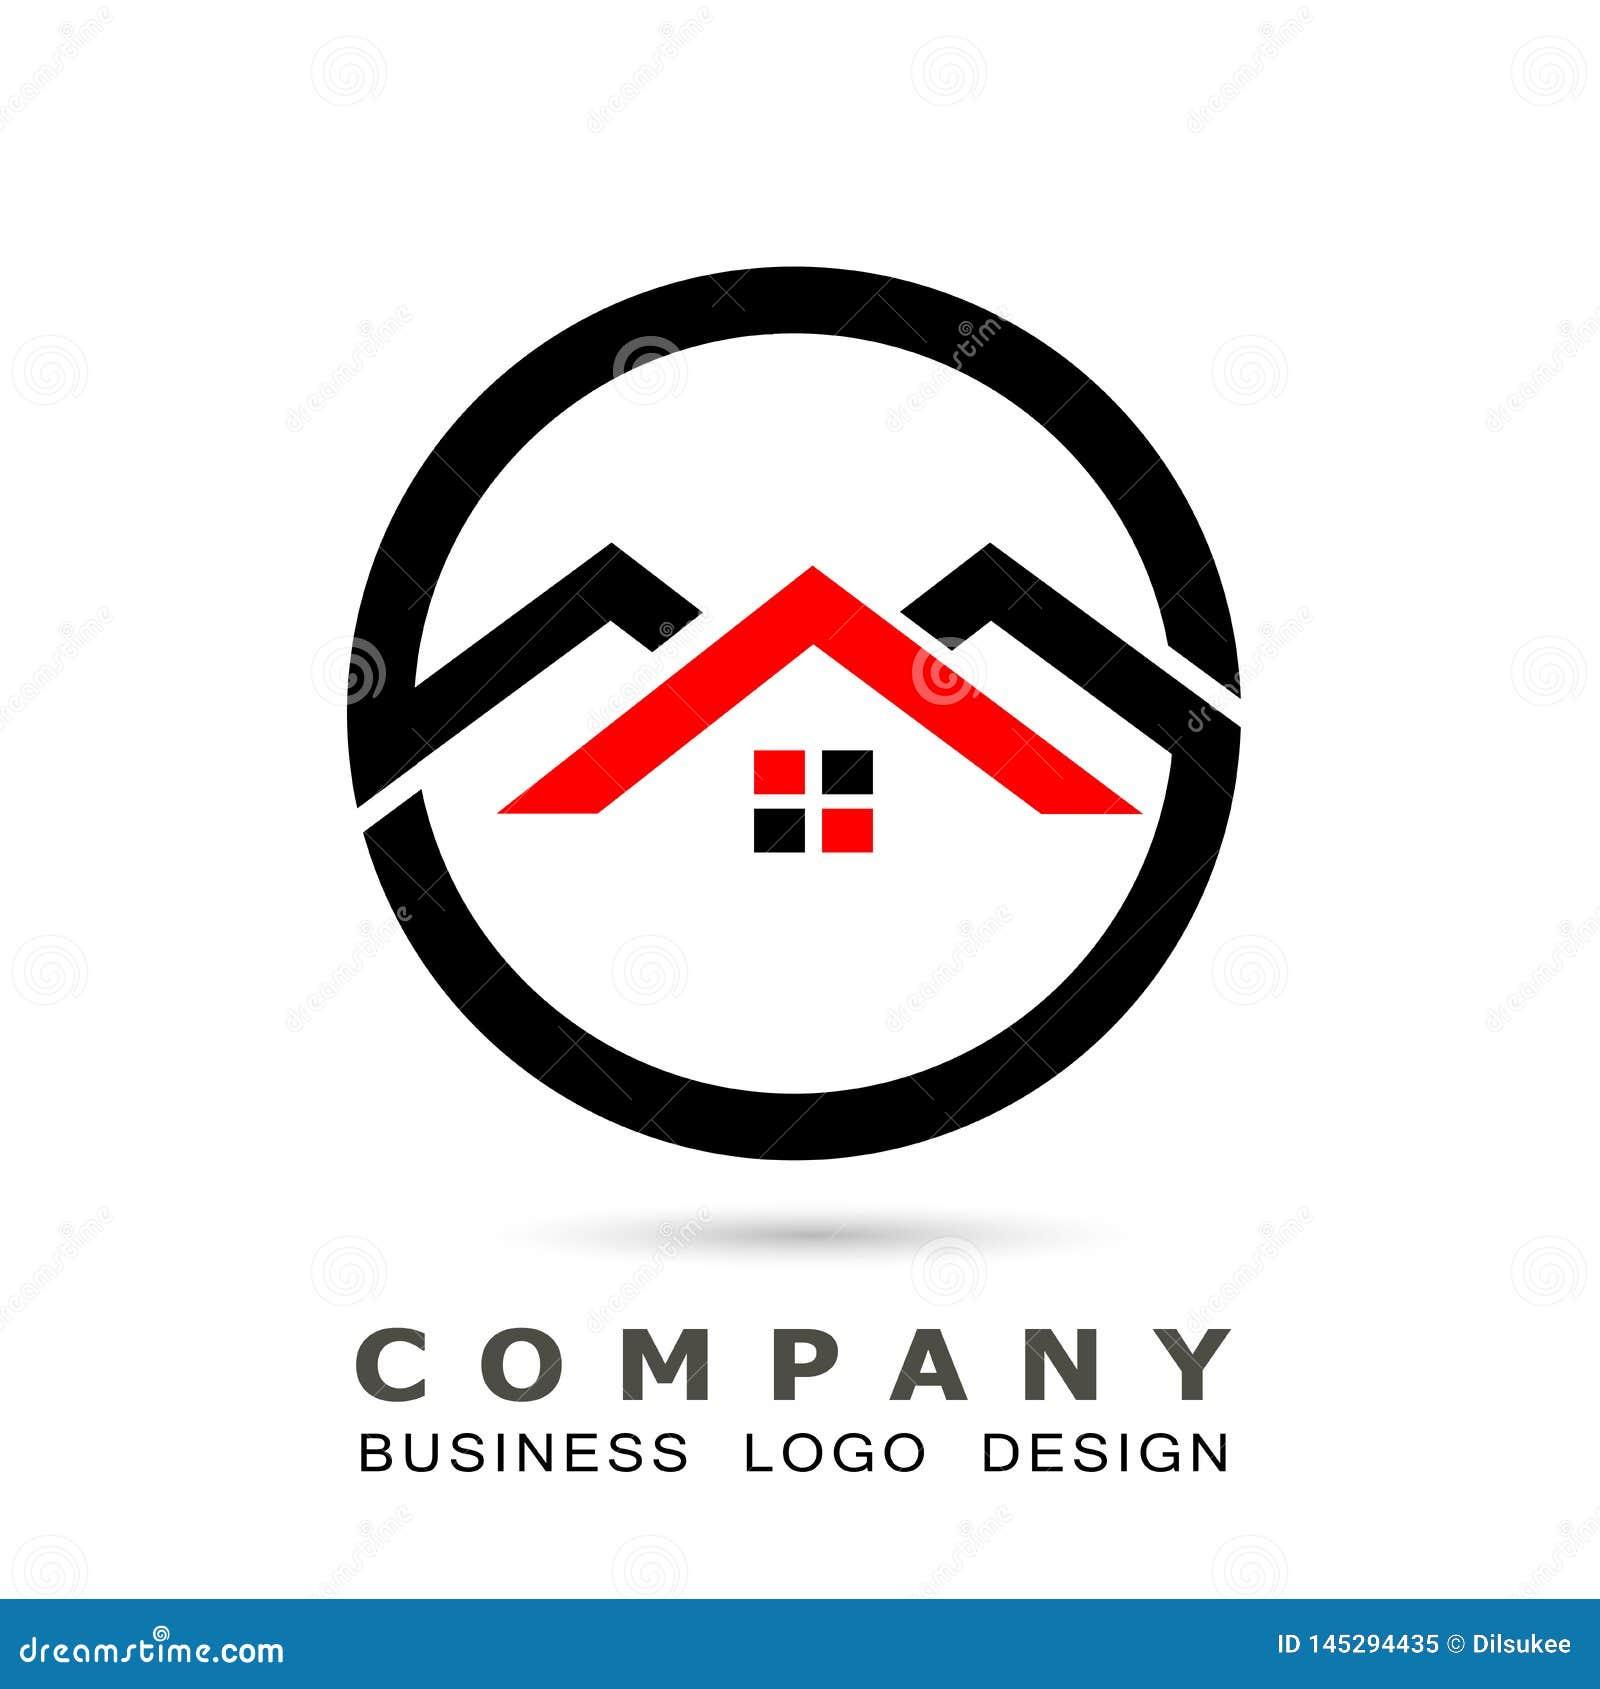 Vetor abstrato do projeto do ?cone do telhado da casa dos bens imobili?rios e do elemento do vetor do logotipo da casa no fundo b